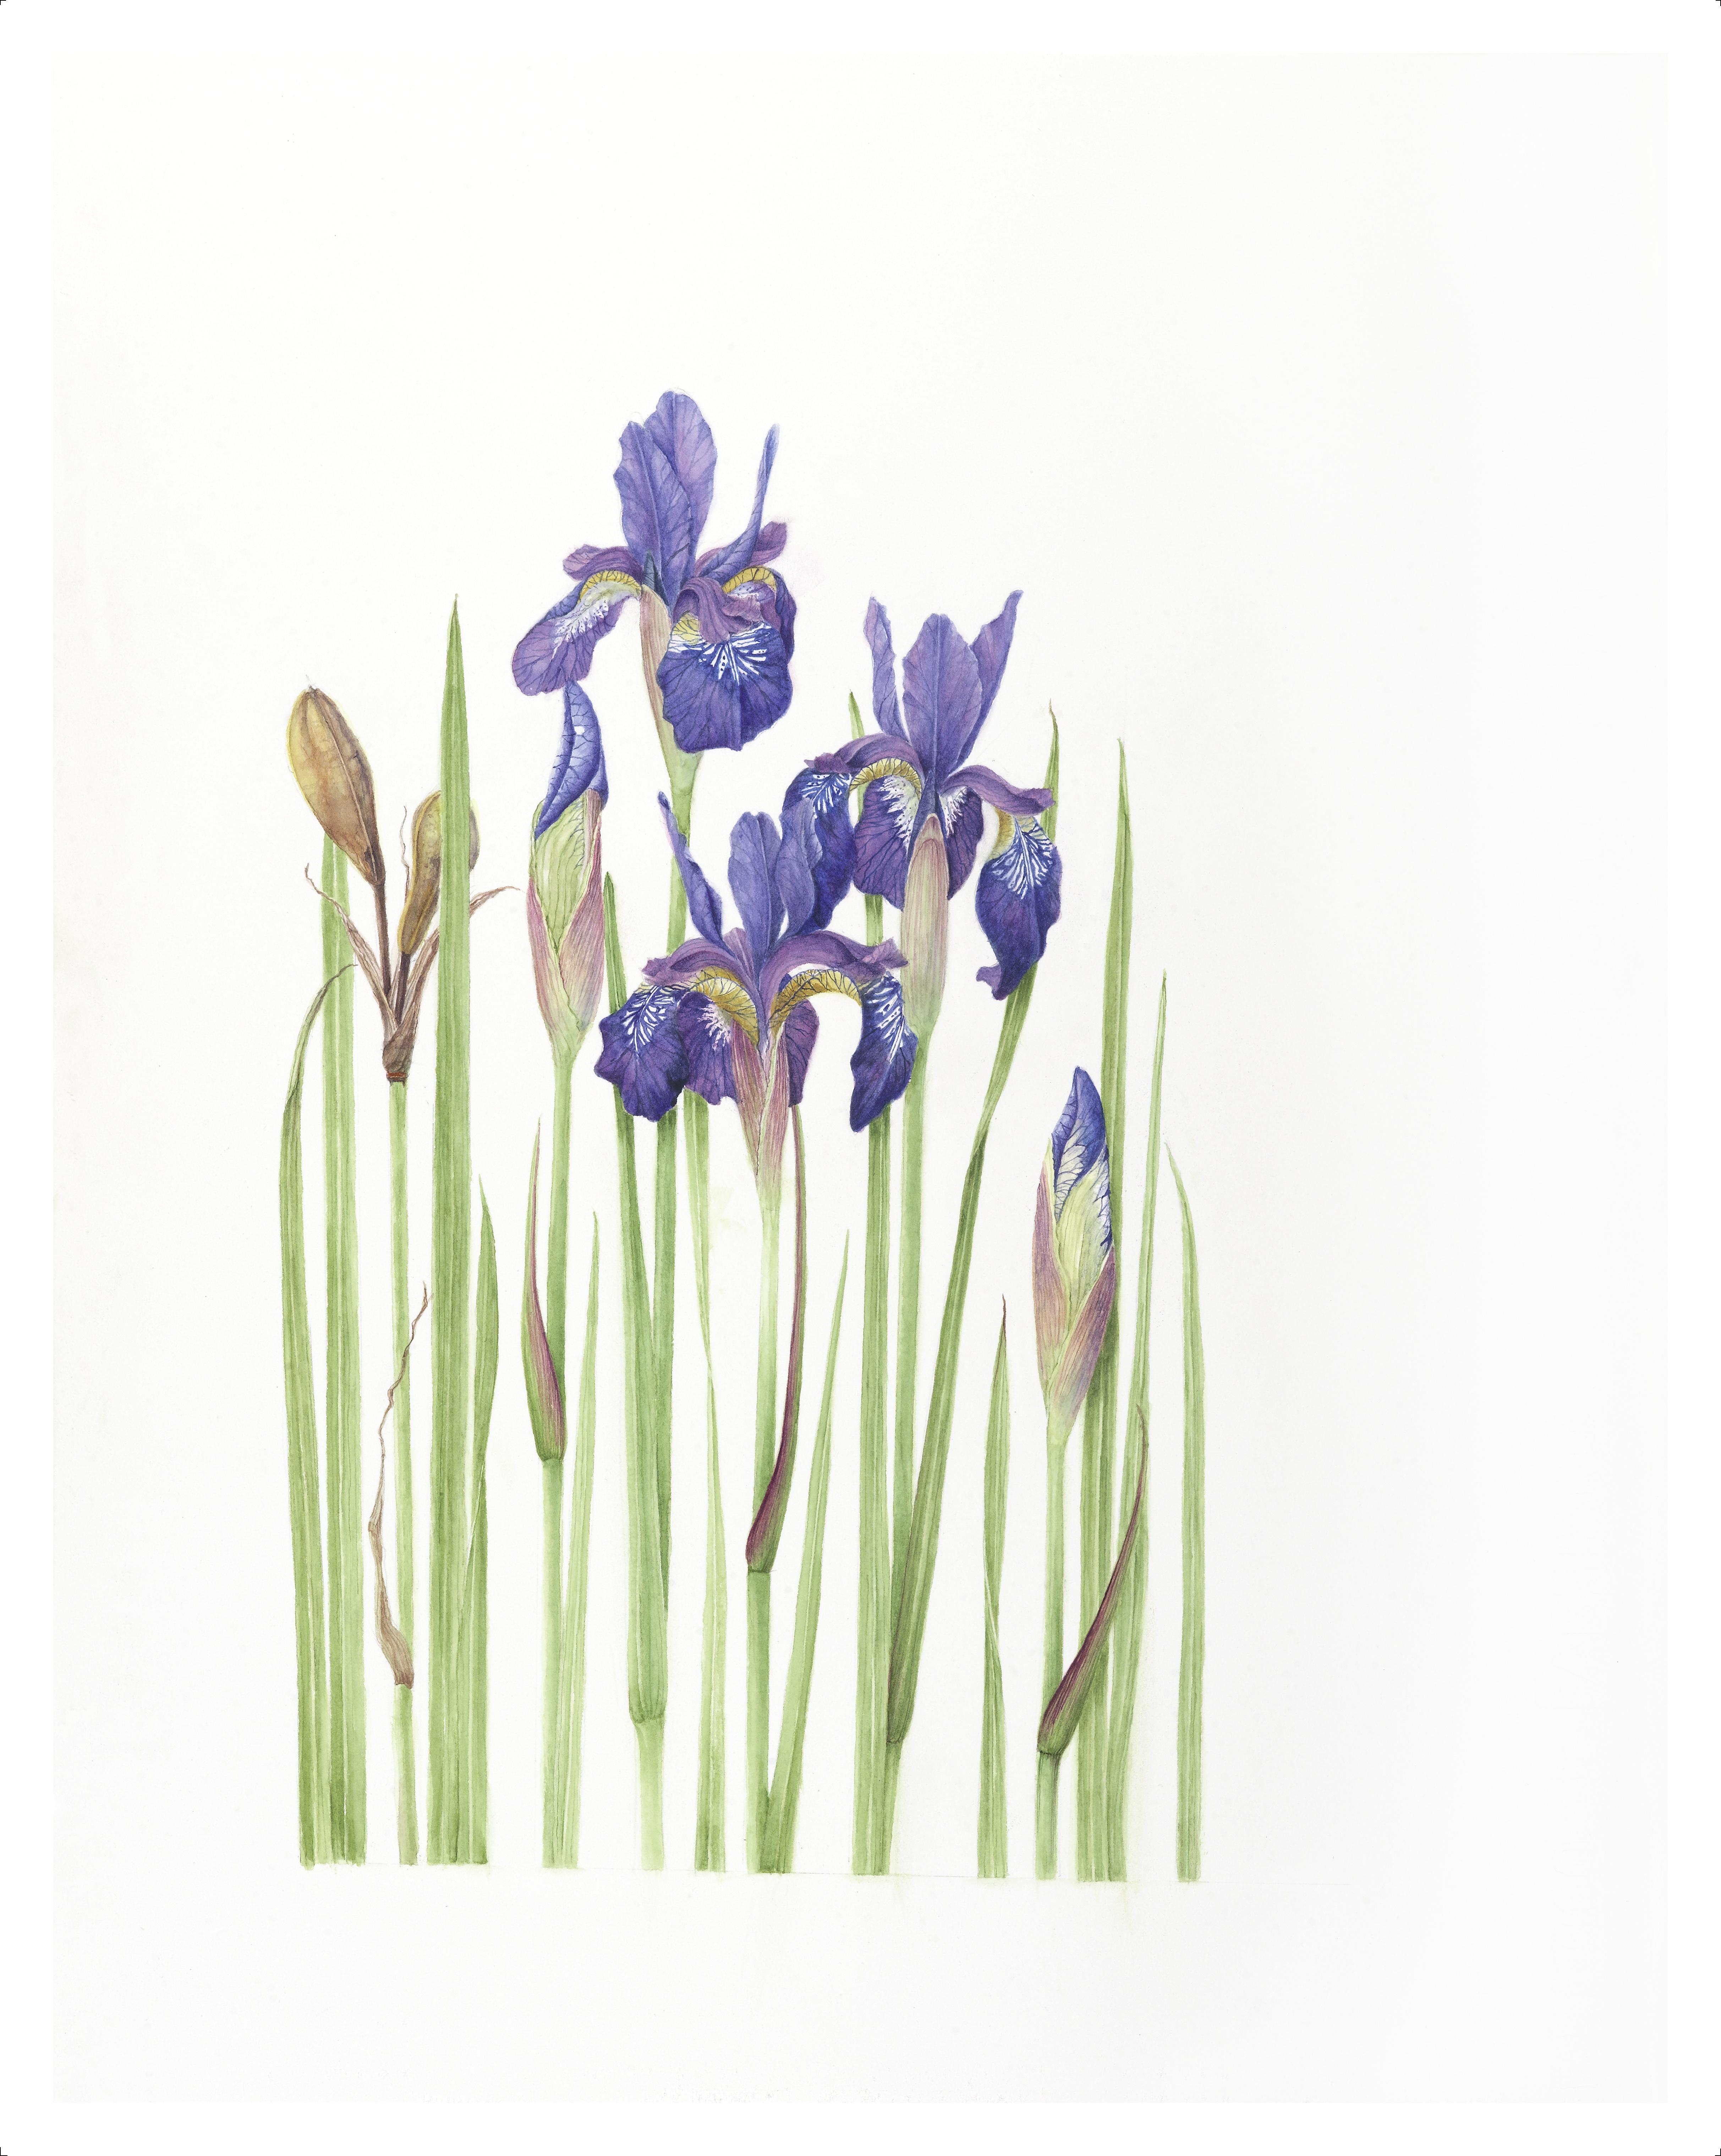 Siberian Iris-D'Zmura giclee 5/10 $145